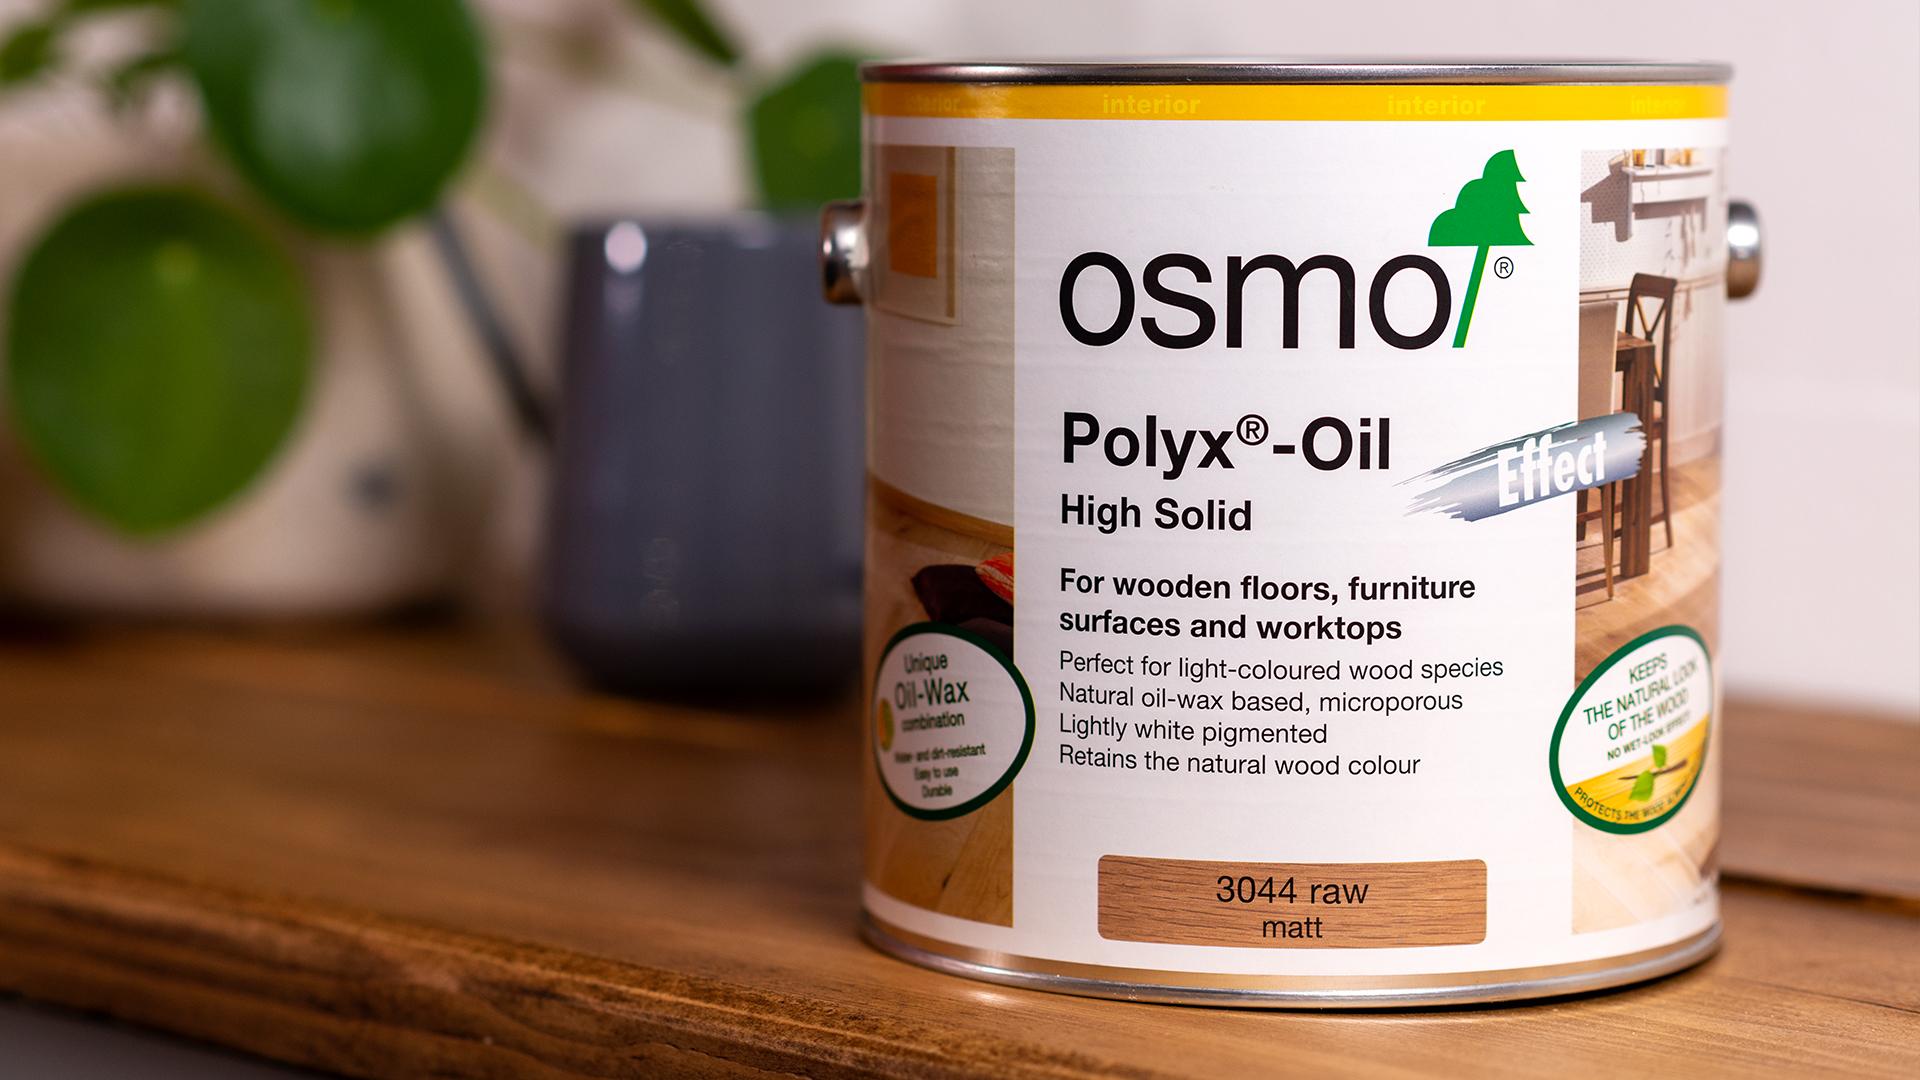 osmo-polyx